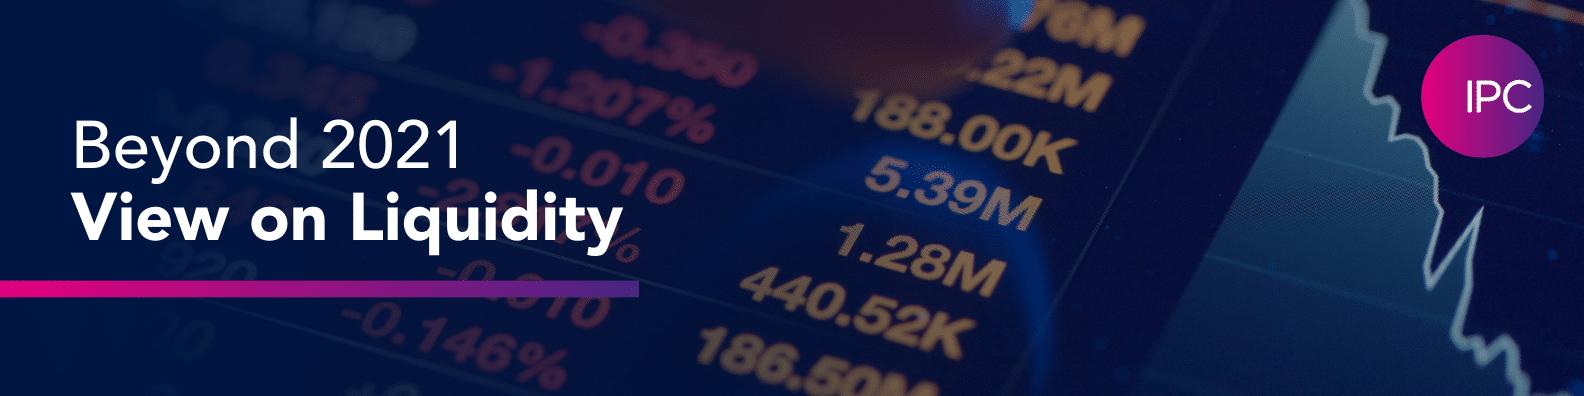 beyond-2021-view-on-liquidity